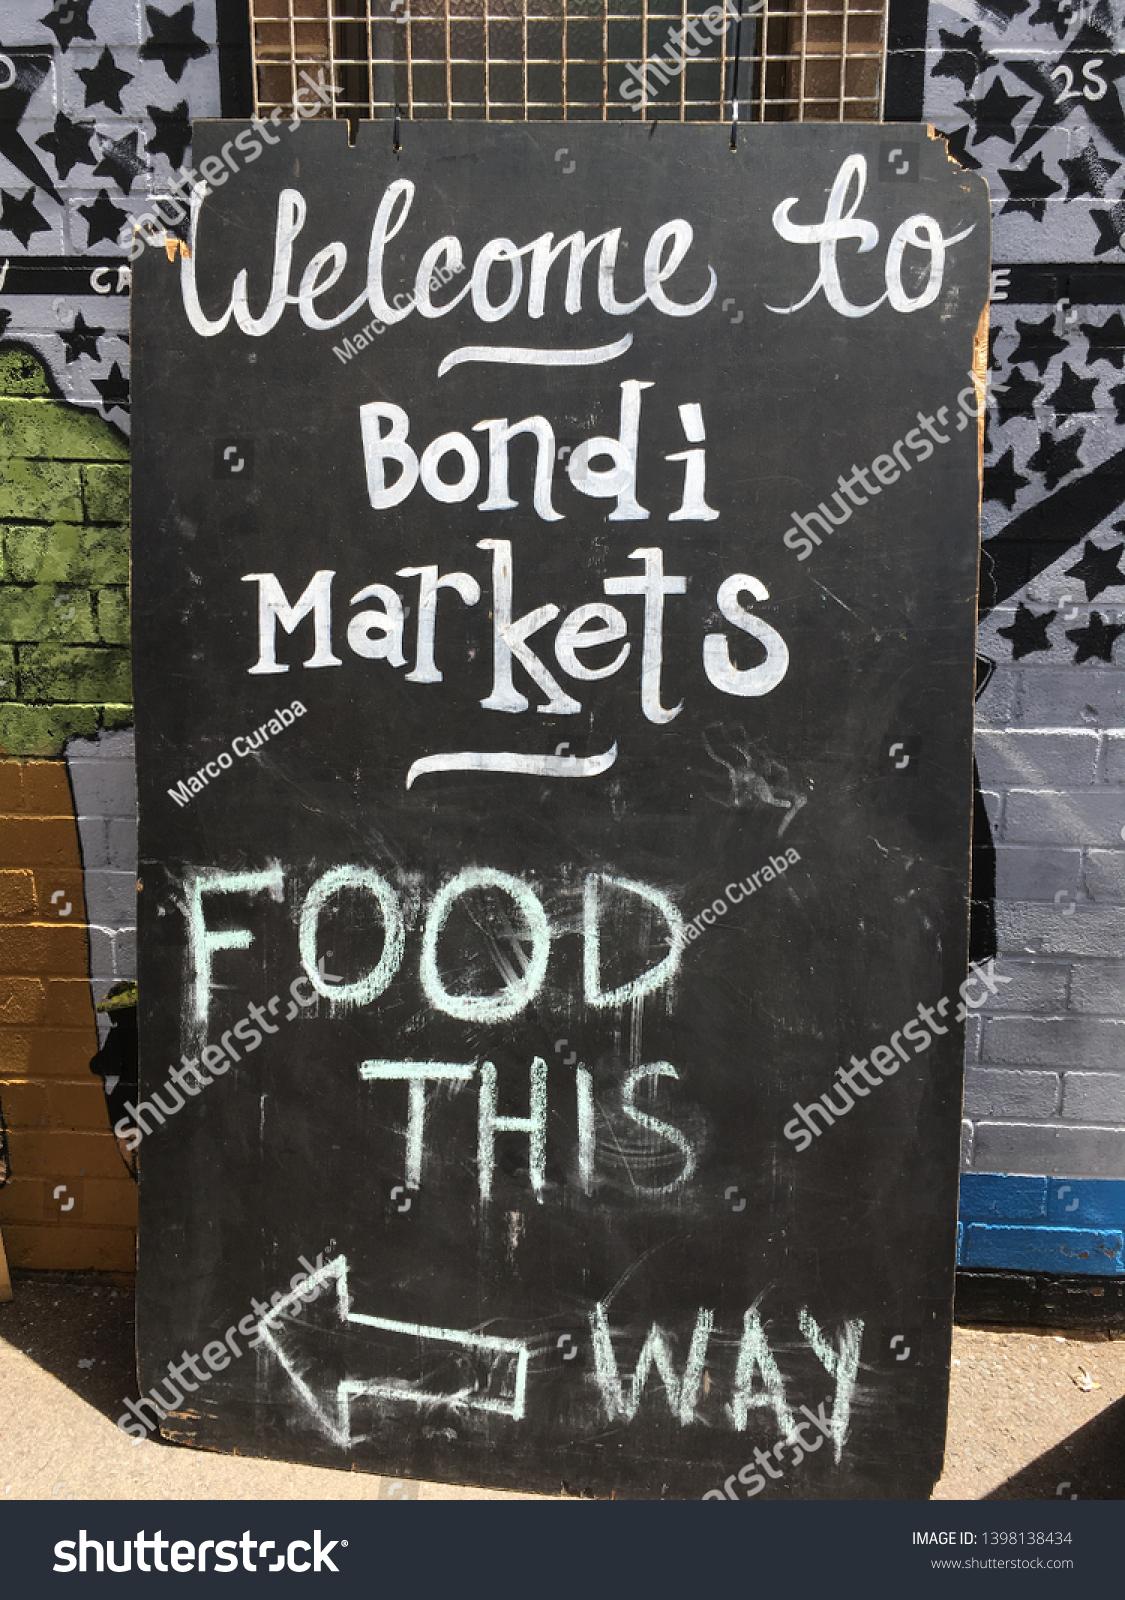 stock-photo-to-bondi-beach-markets-bondi